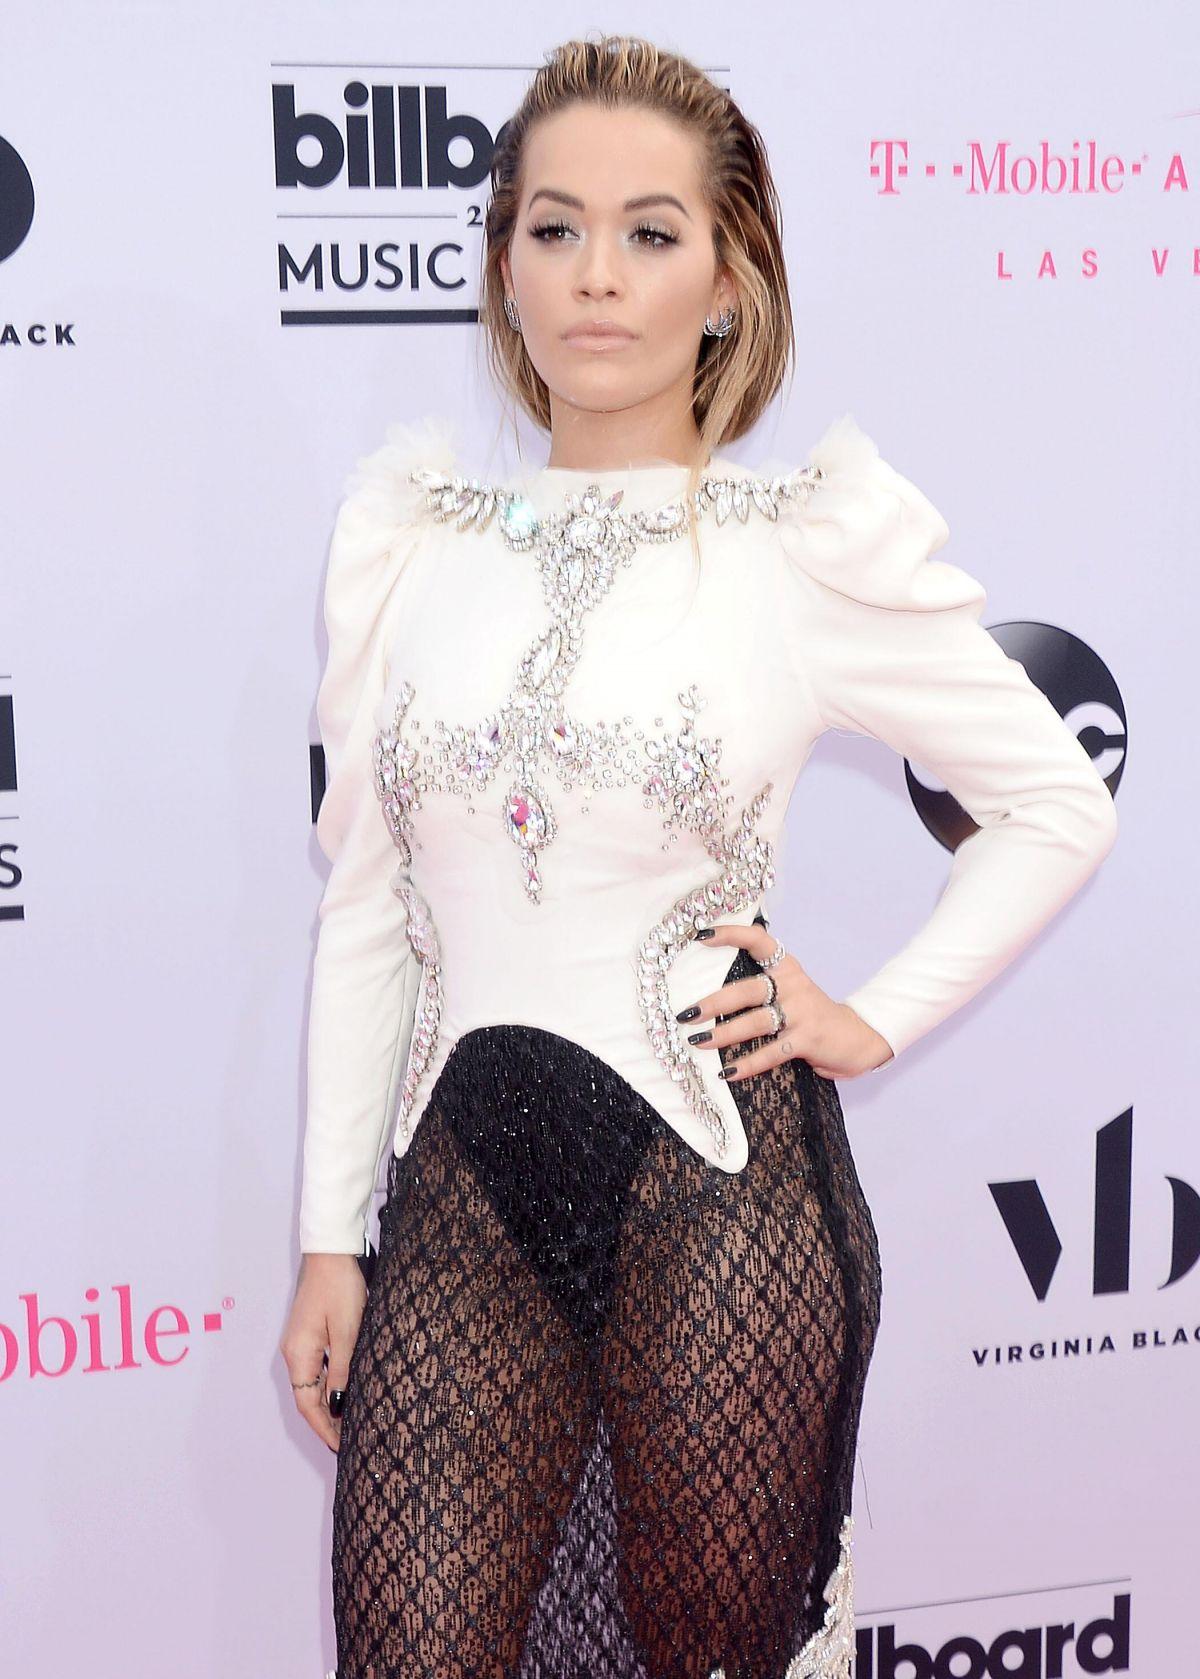 Rita ora billboard music awards in las vegas nude (75 pictures)